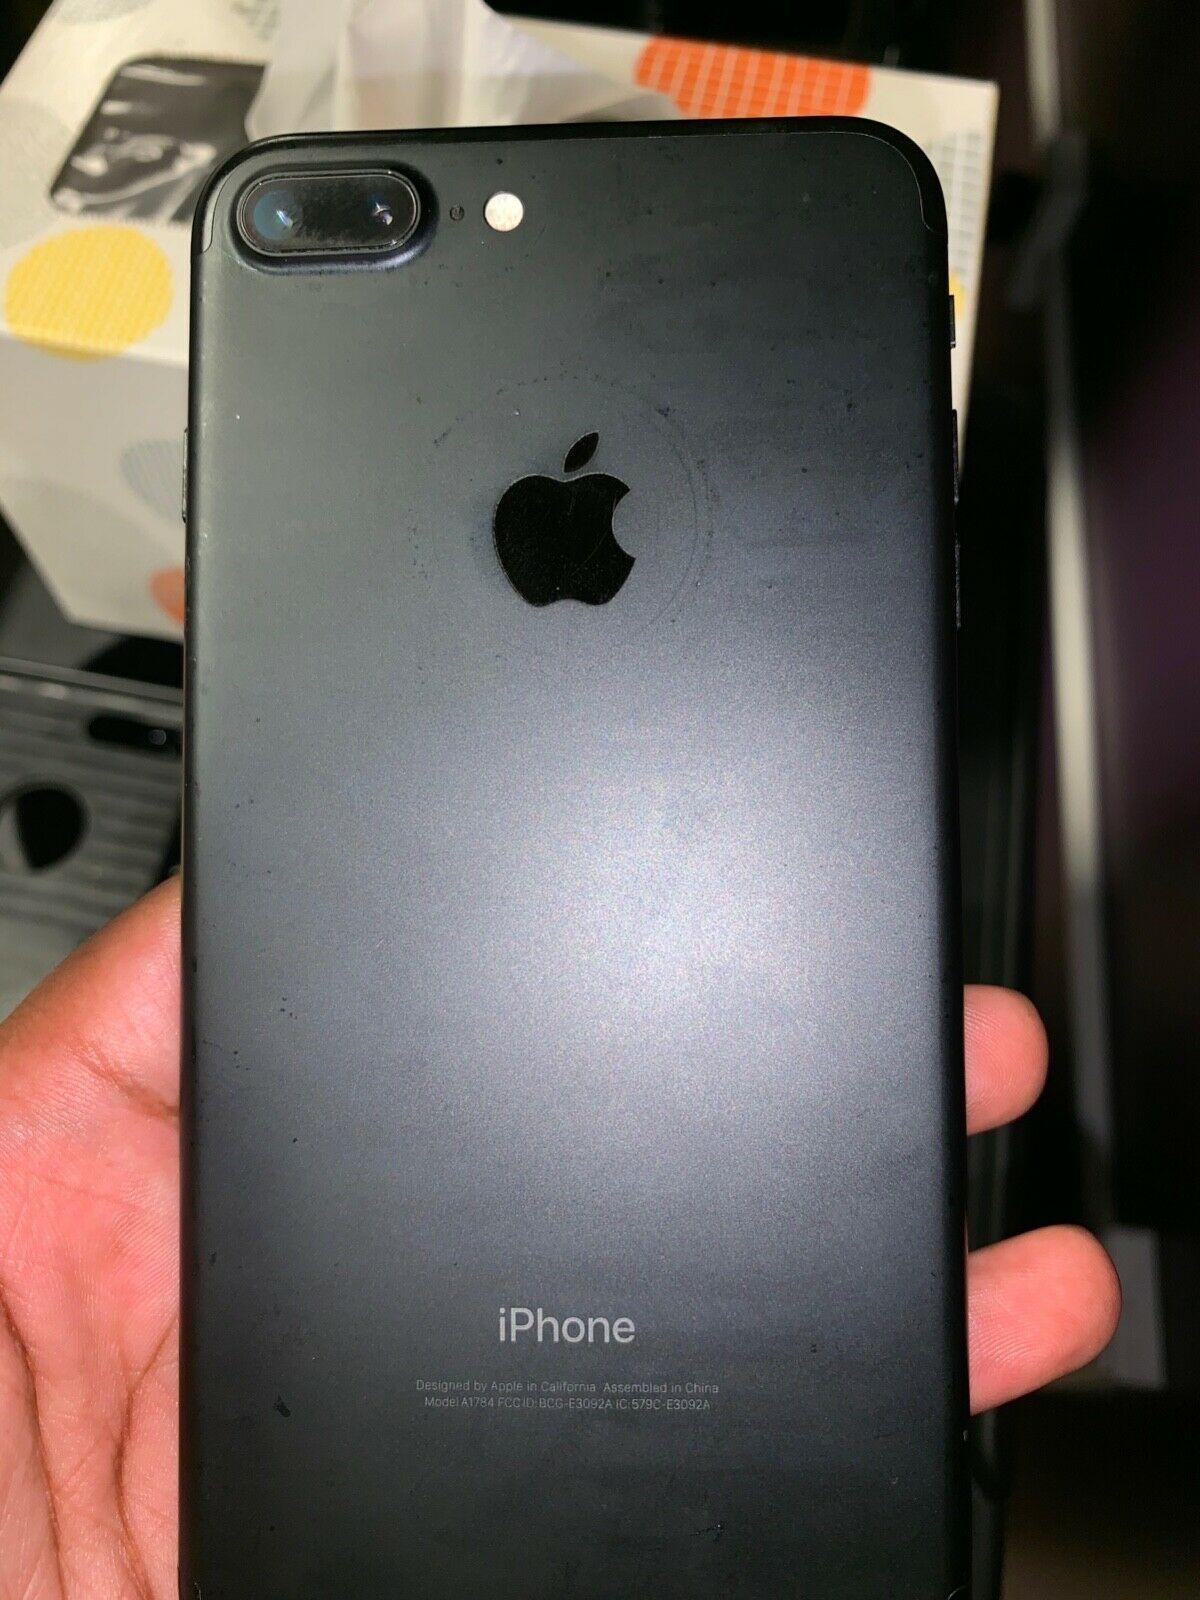 Apple Iphone 7 Plus 32gb Black Unlocked Smartphone Celulares Iphone Coisas De Iphone Iphone